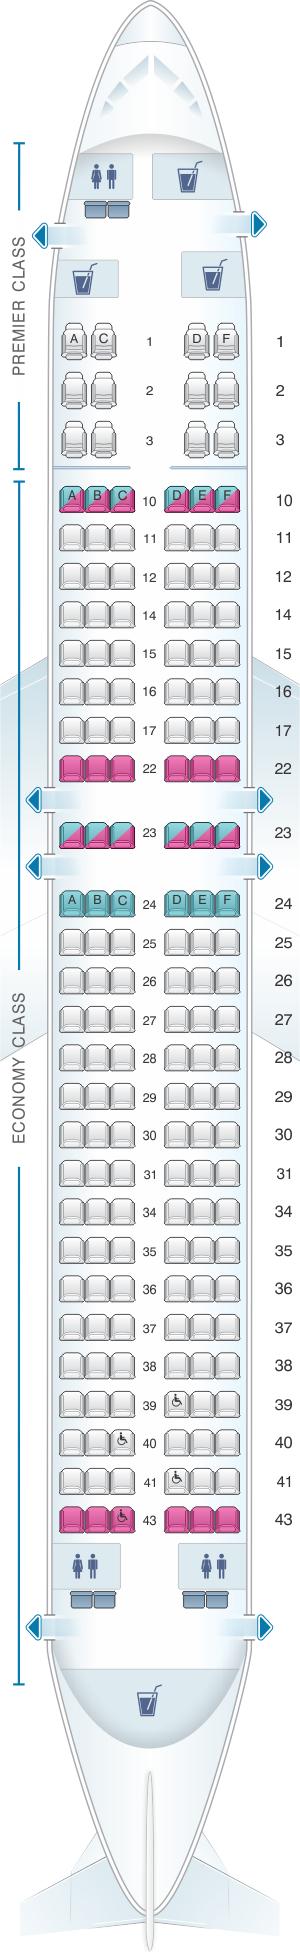 Seat map for Jet Airways Boeing B737 800 168PAX